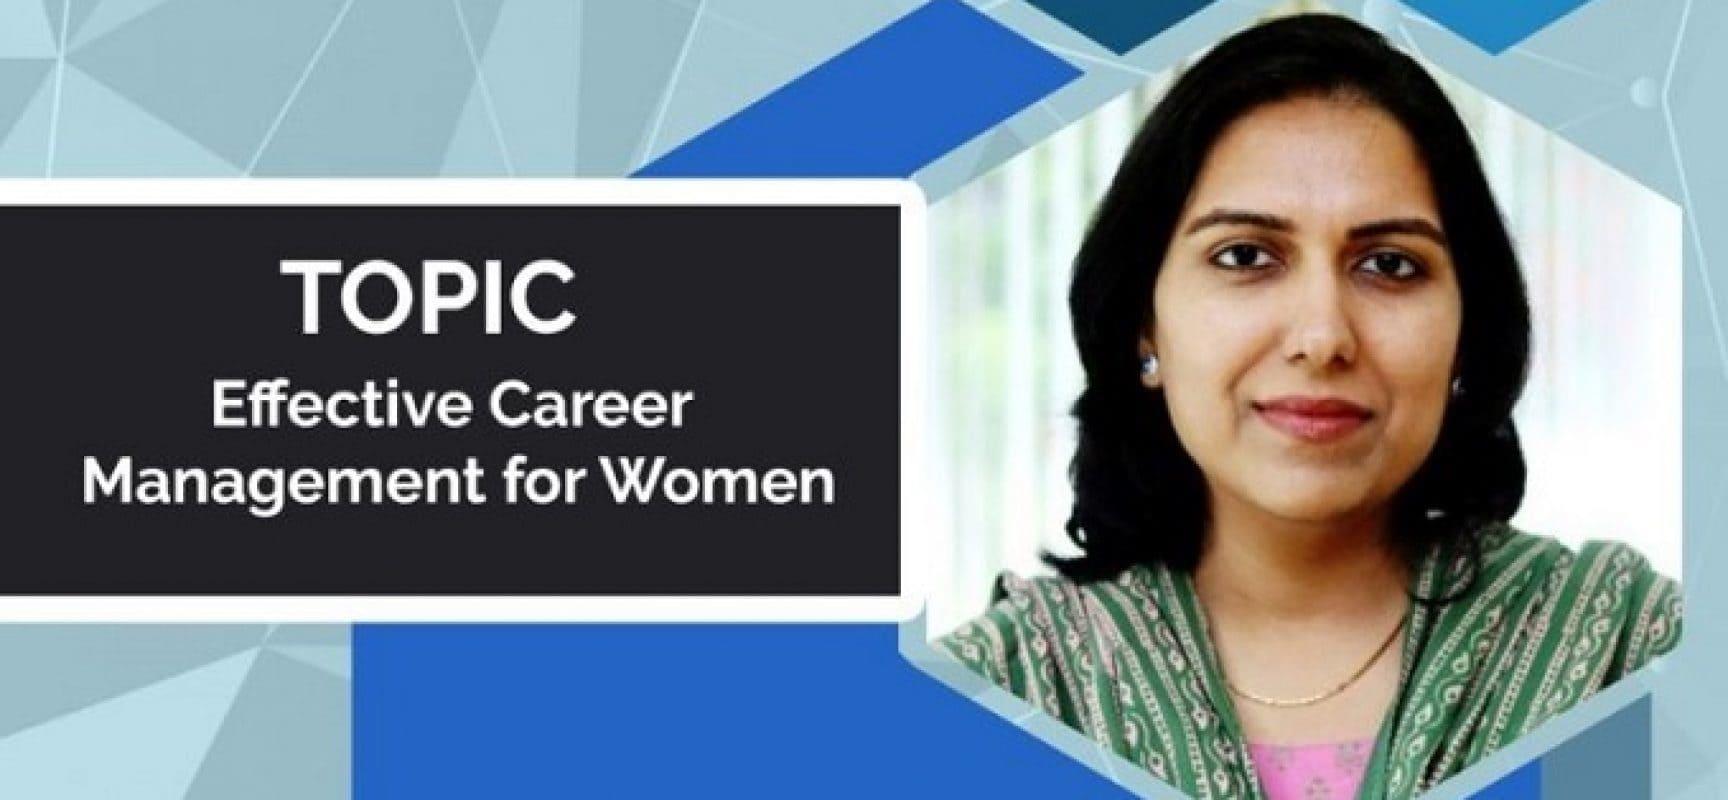 Effective Career Management for Women